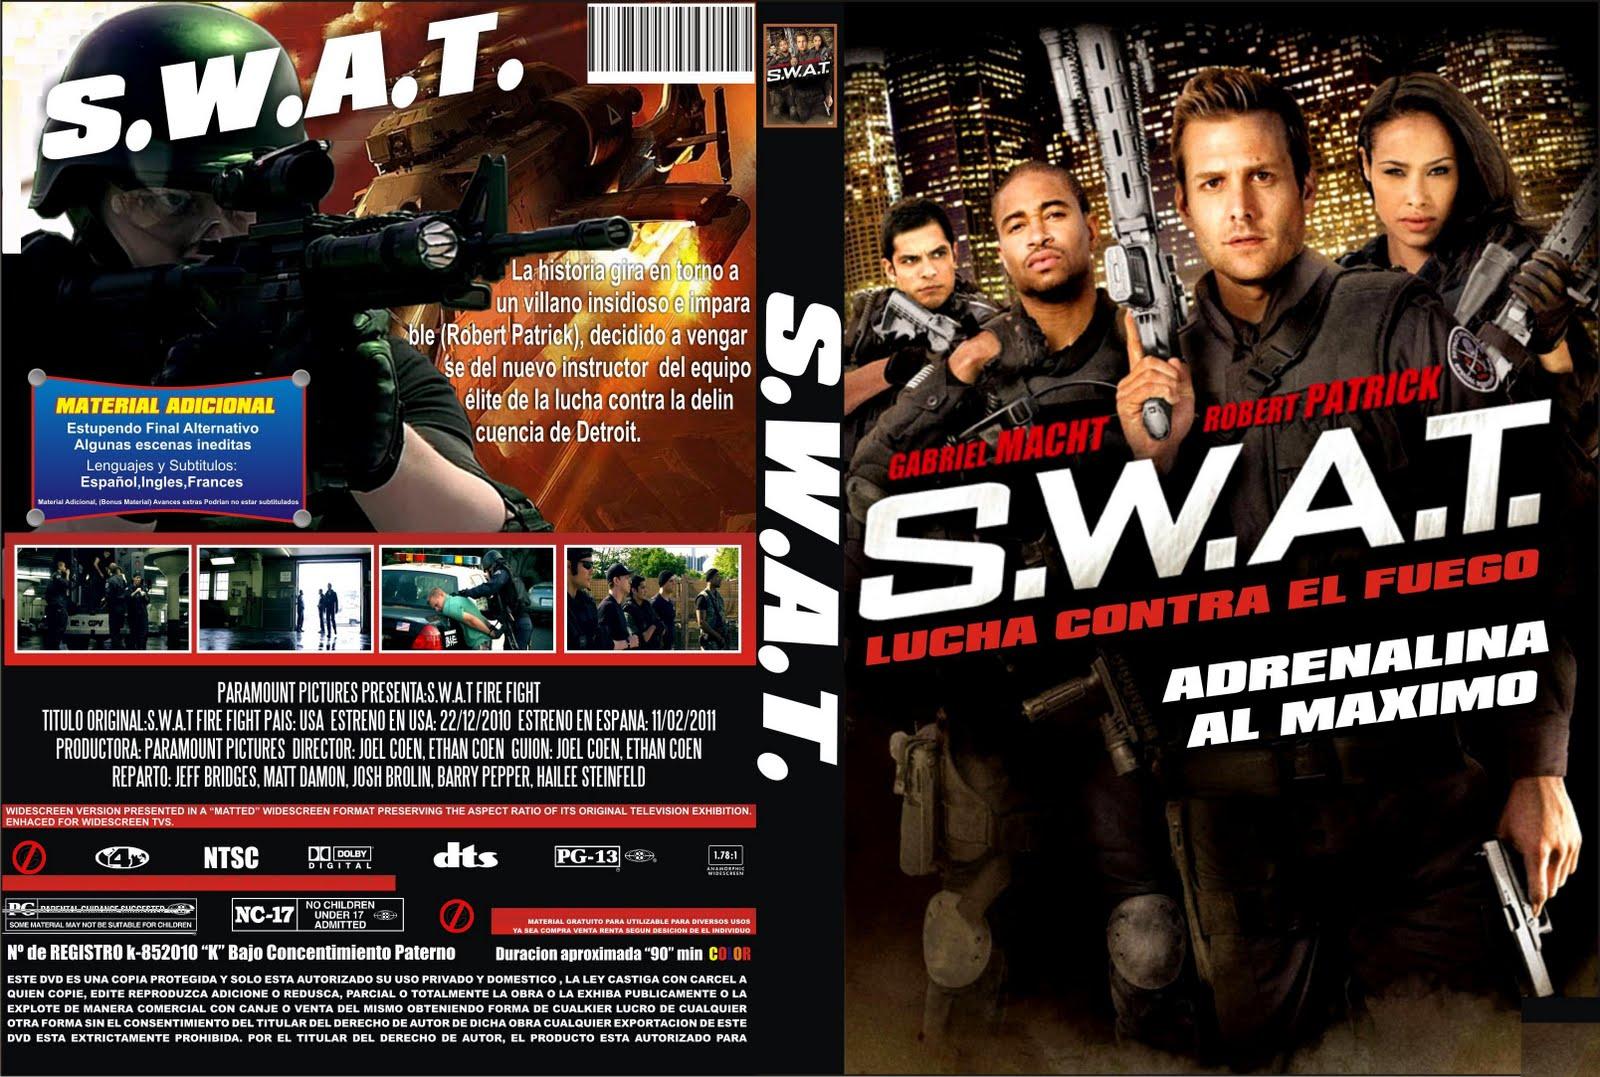 http://4.bp.blogspot.com/-kXFczHYzHrI/TZPFLvCcHvI/AAAAAAAAAhM/RtEnn0nSR2I/s1600/Swat_-_Lucha_Contra_El_Fuego_-_Custom_por_fox22.jpg